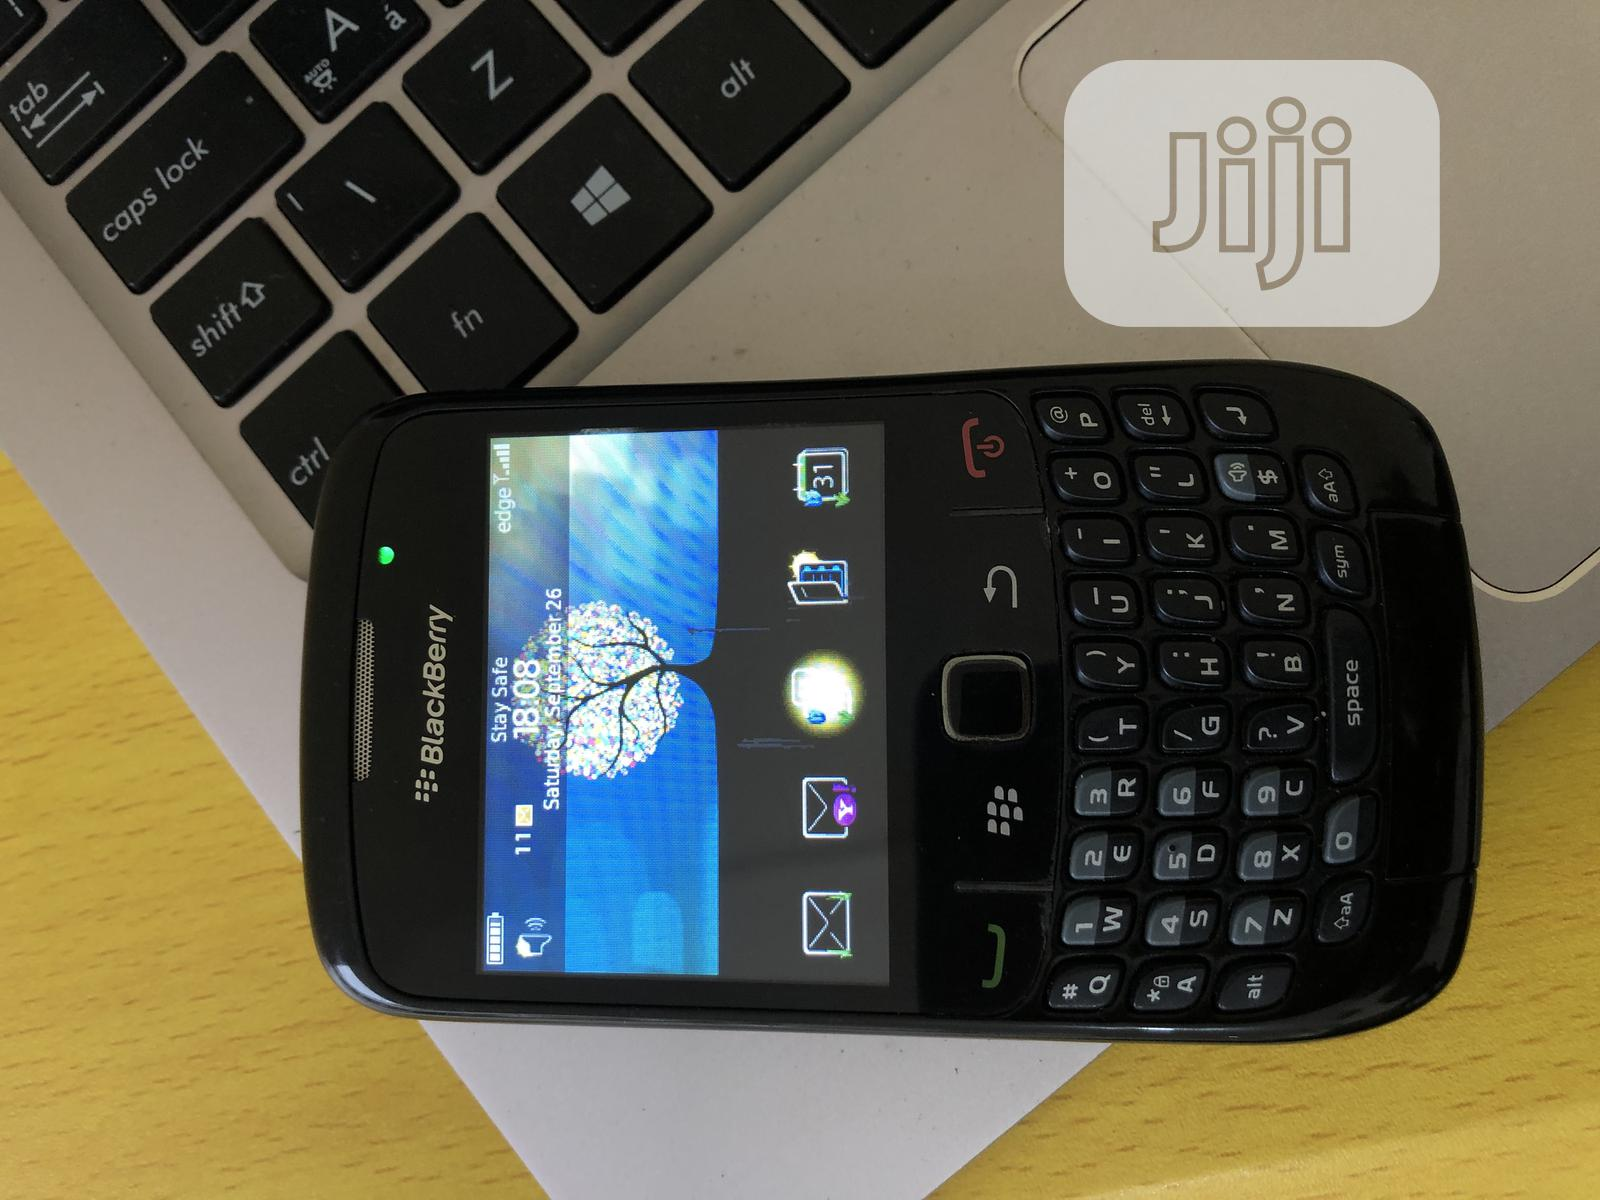 Archive: BlackBerry Curve 8520 Black